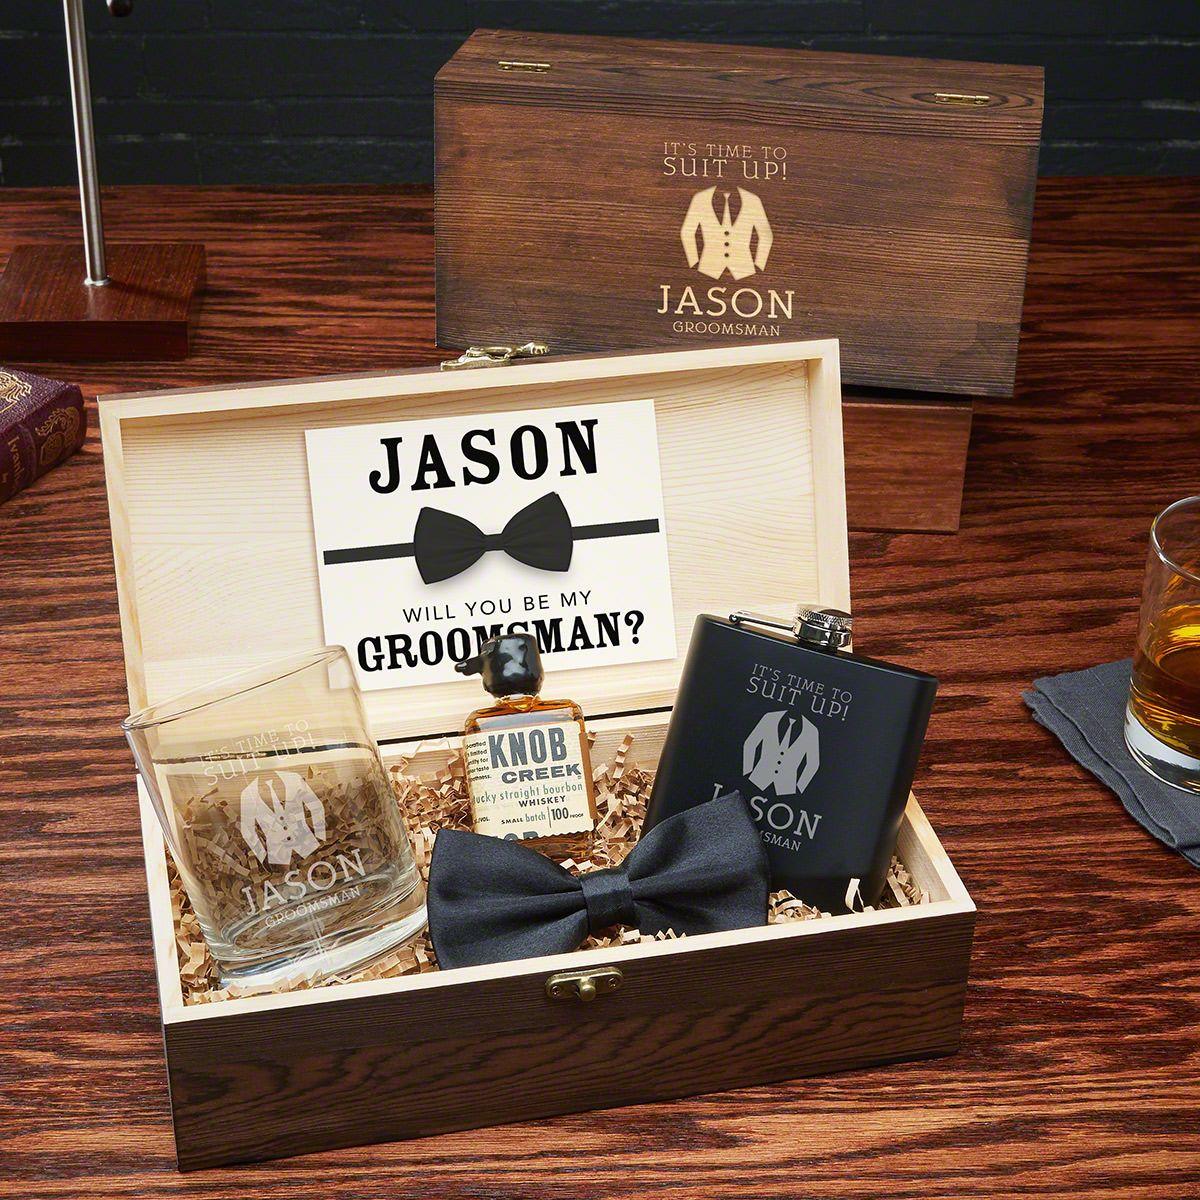 Suit Up Whiskey Custom Groomsman Gift Set